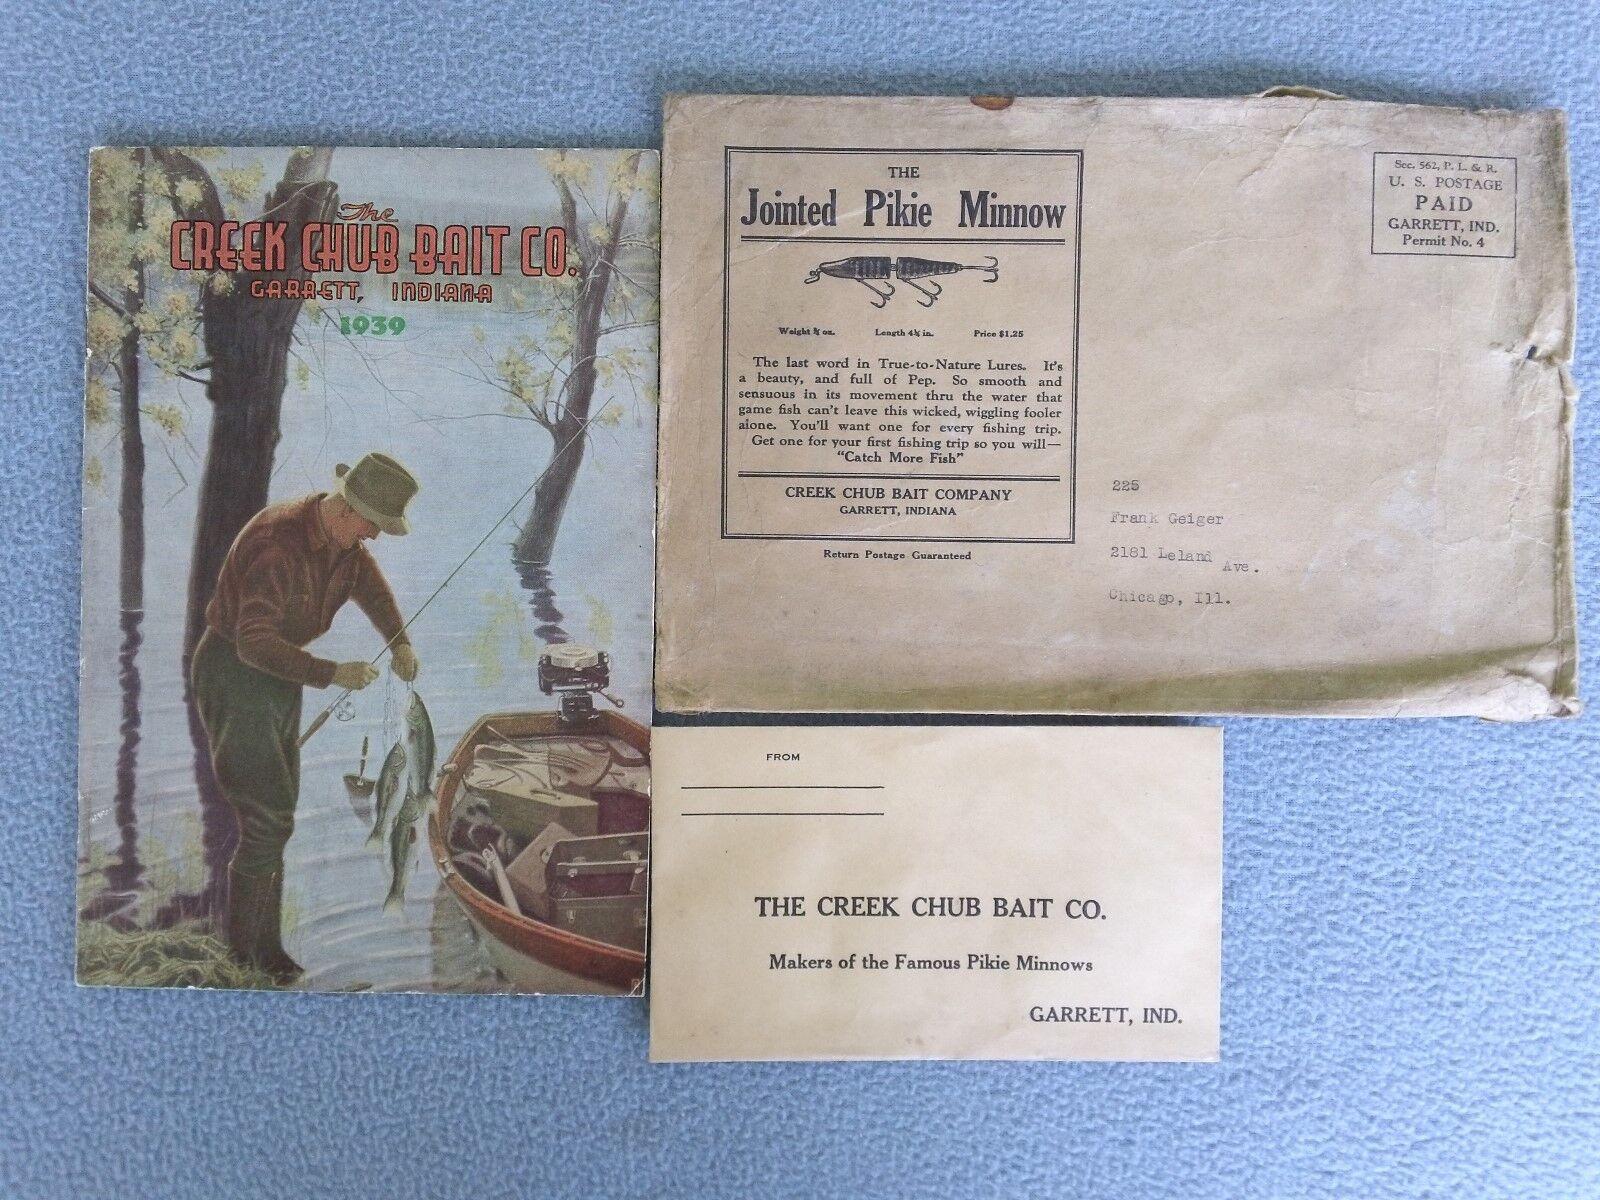 RARE VINTAGE 1939 CREEK CHUB BAIT COMPANY CATALOG-GARRETT, INDIANA -VERY GOOD